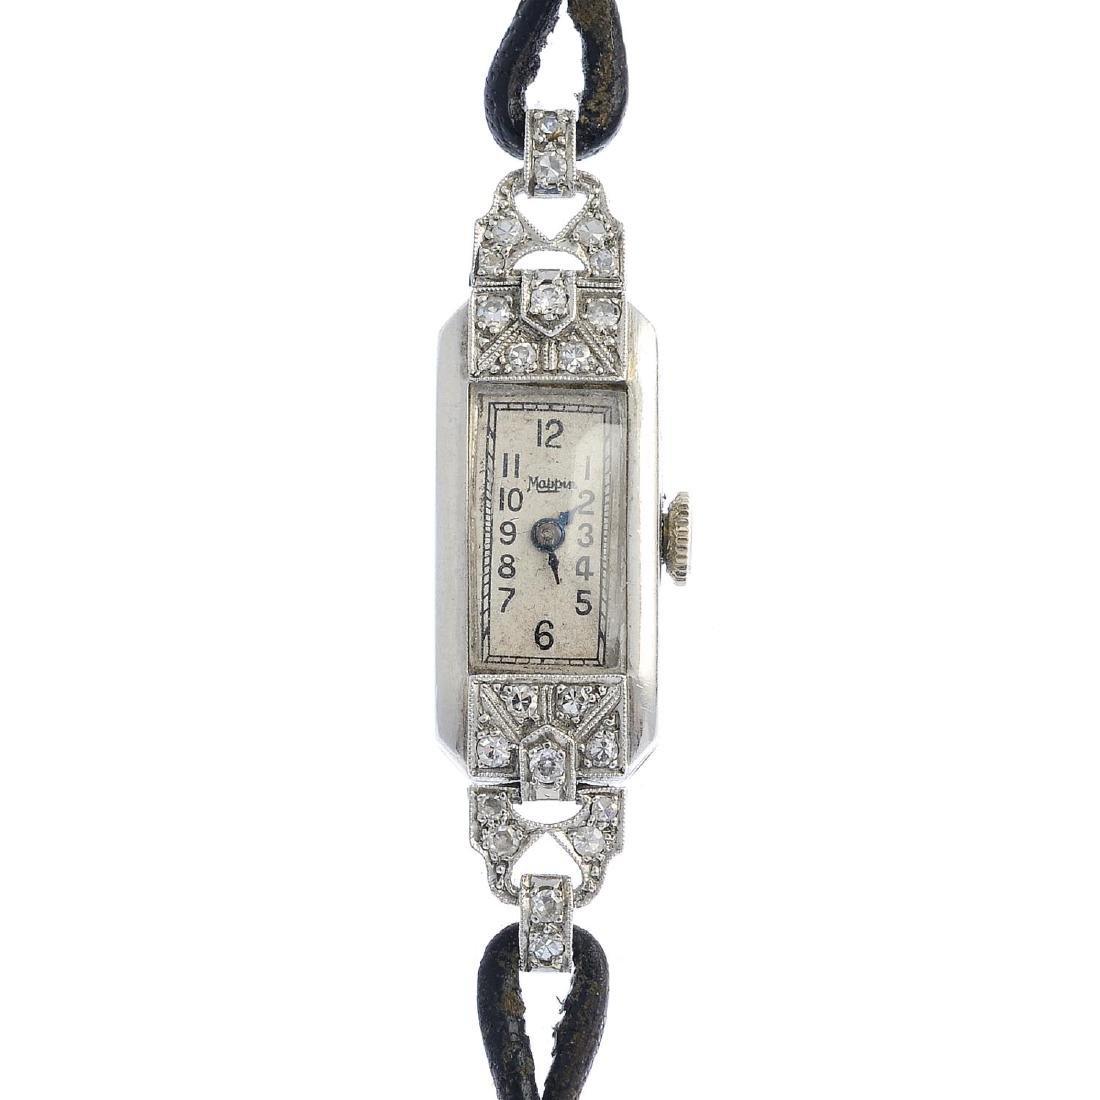 MAPPIN - a lady's mid 20th century platinum diamond